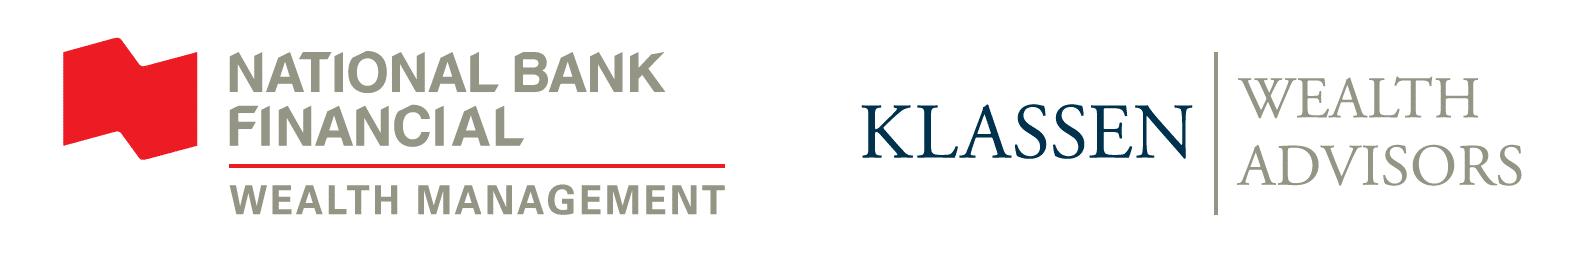 National Bank Financial Weath Management - Klassen Wealth Advisors logo